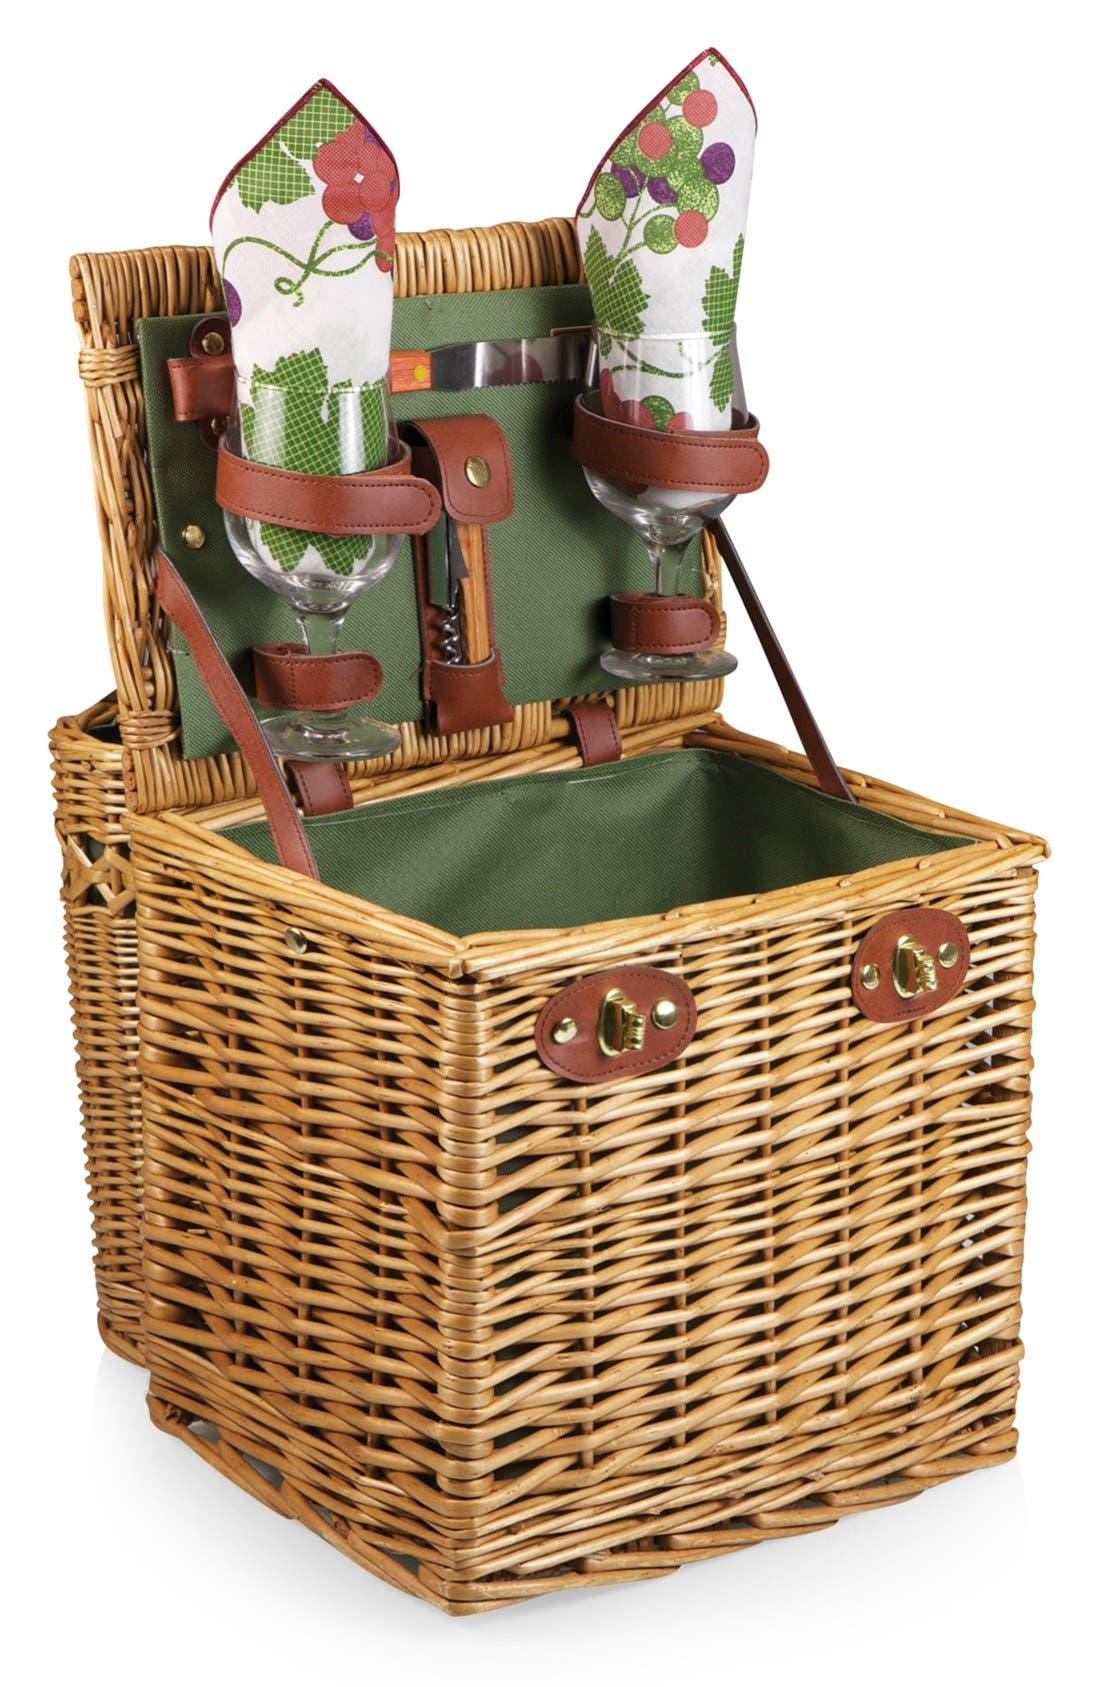 Picnic Time 'Vino' Wine & Cheese Picnic Basket